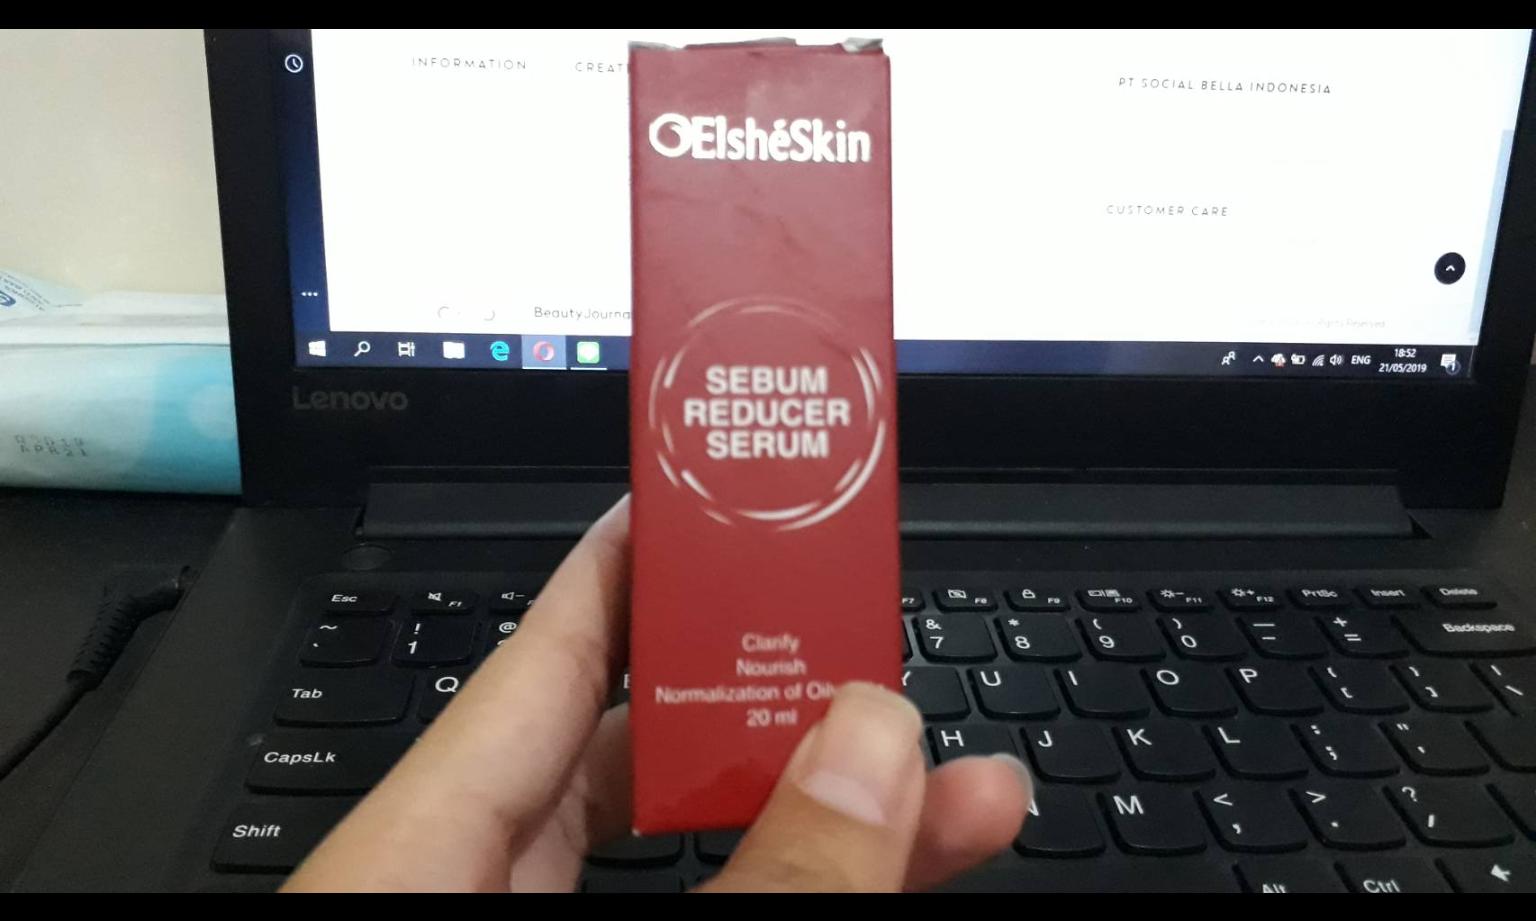 ElshéSkin Sebum Reducer Serum